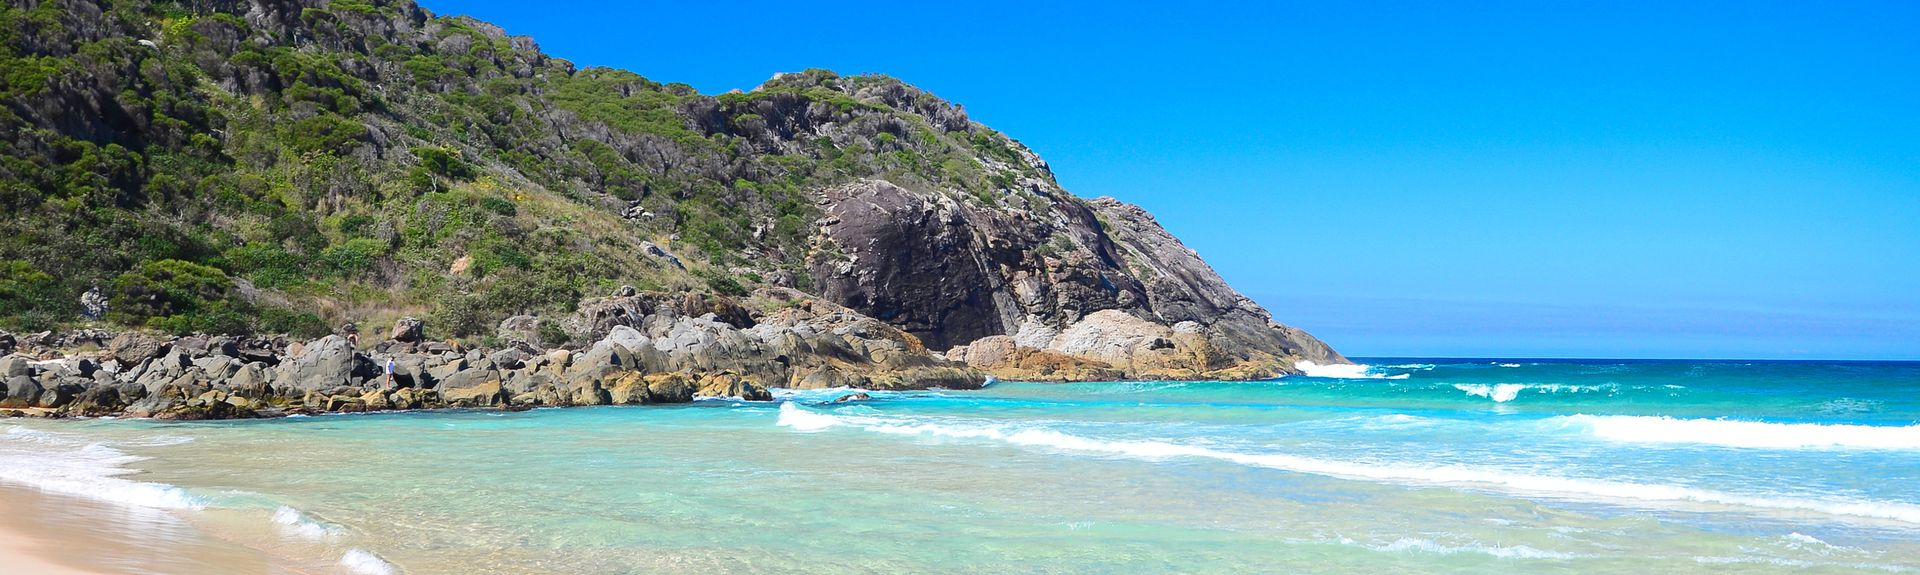 Boomerang Beach, New South Wales, Australië